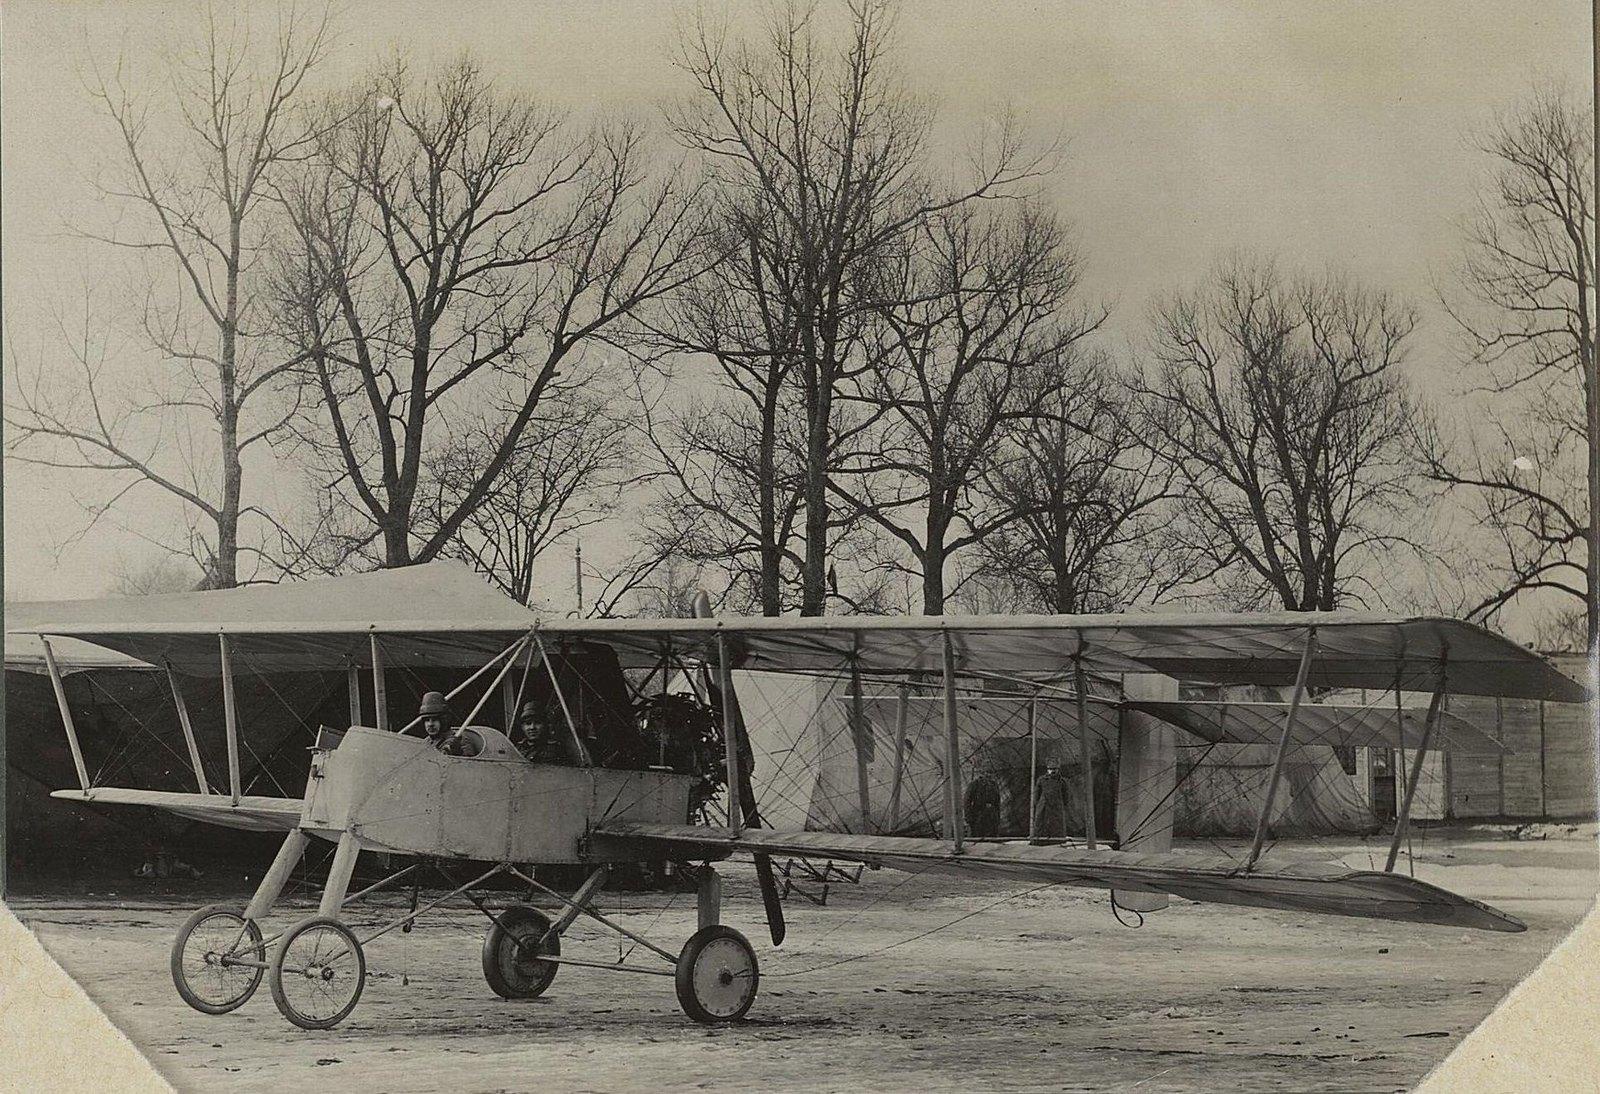 27. 1917. Самолёт «Вуазен» на снегу под деревьями